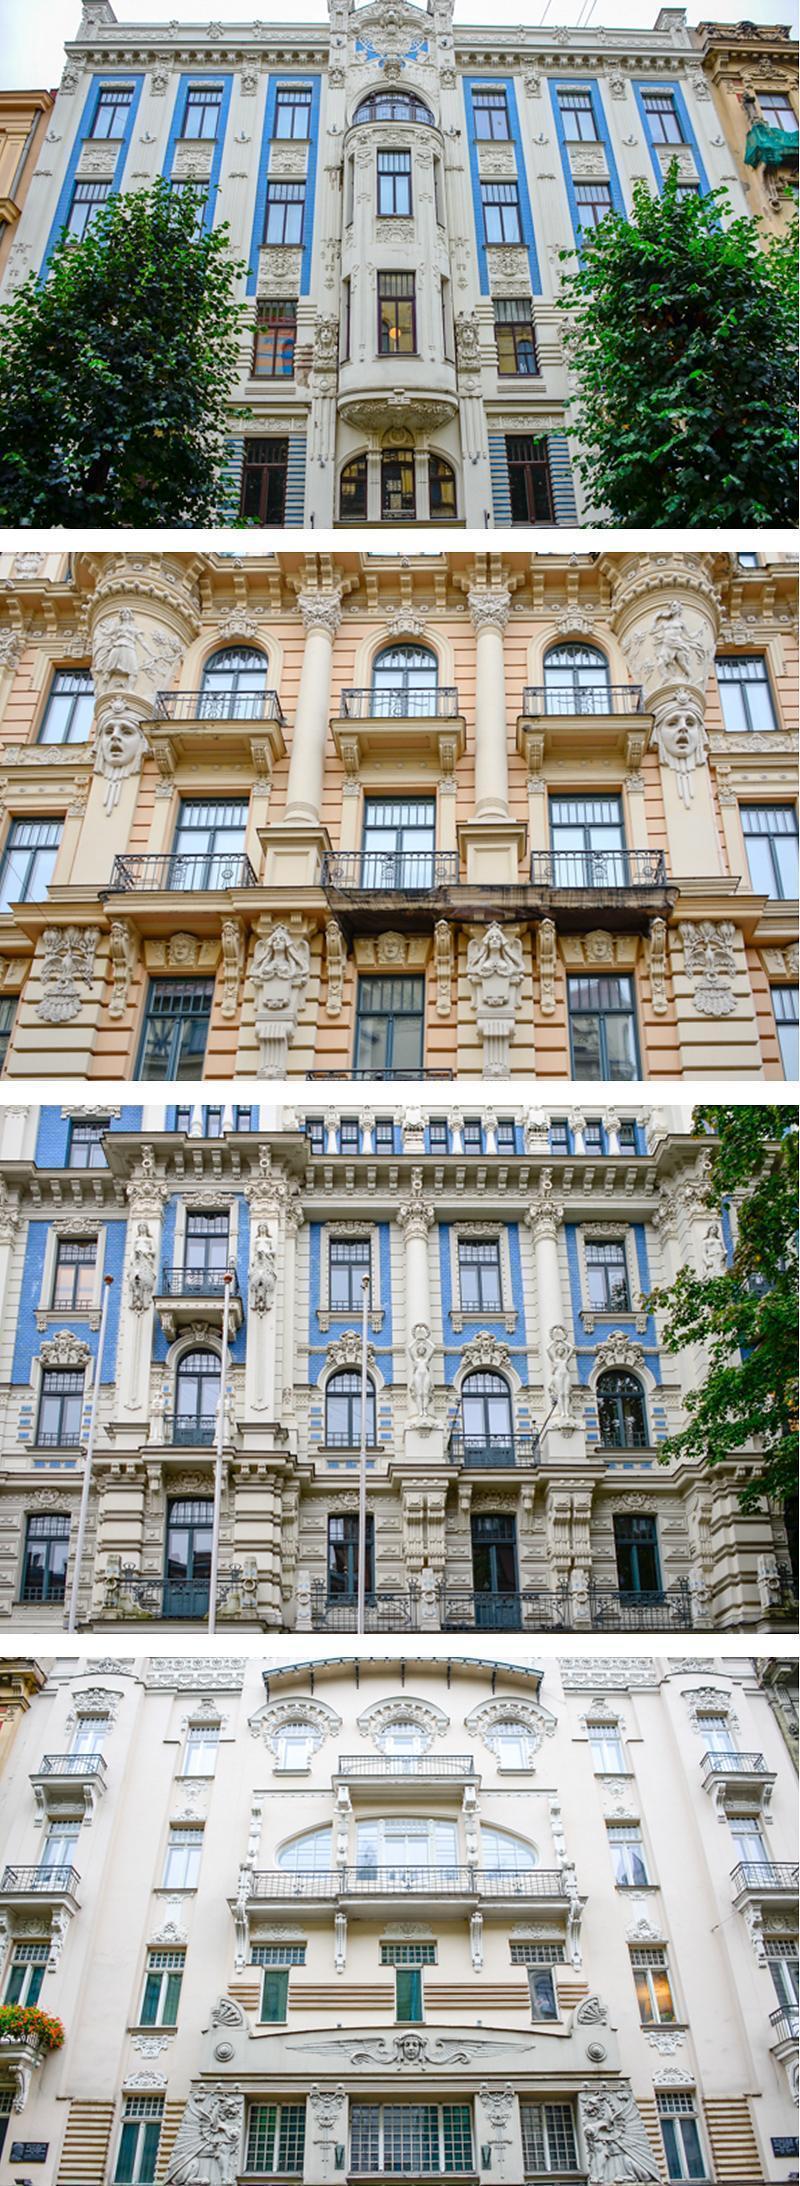 Riga's stunning Art Nouveau architecture is best viewed on Alberta Street